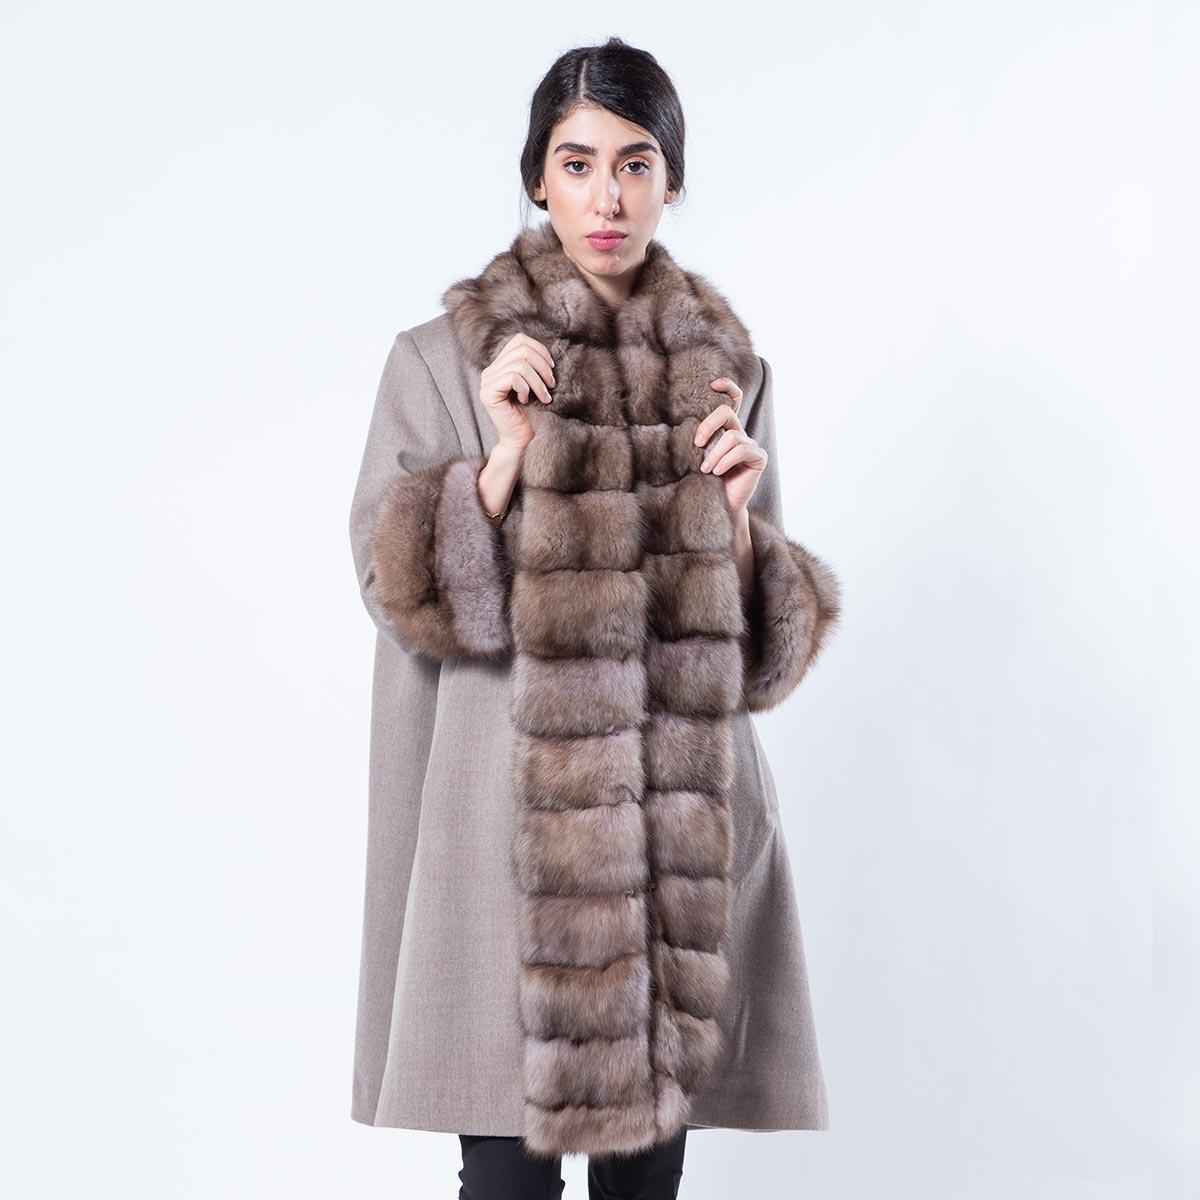 Cashmere Jacket with Beige Scuro Sable Fur-trim | Кашемировое пальто с отделкой из соболя цвета Beige Scuro - Sarigianni Furs